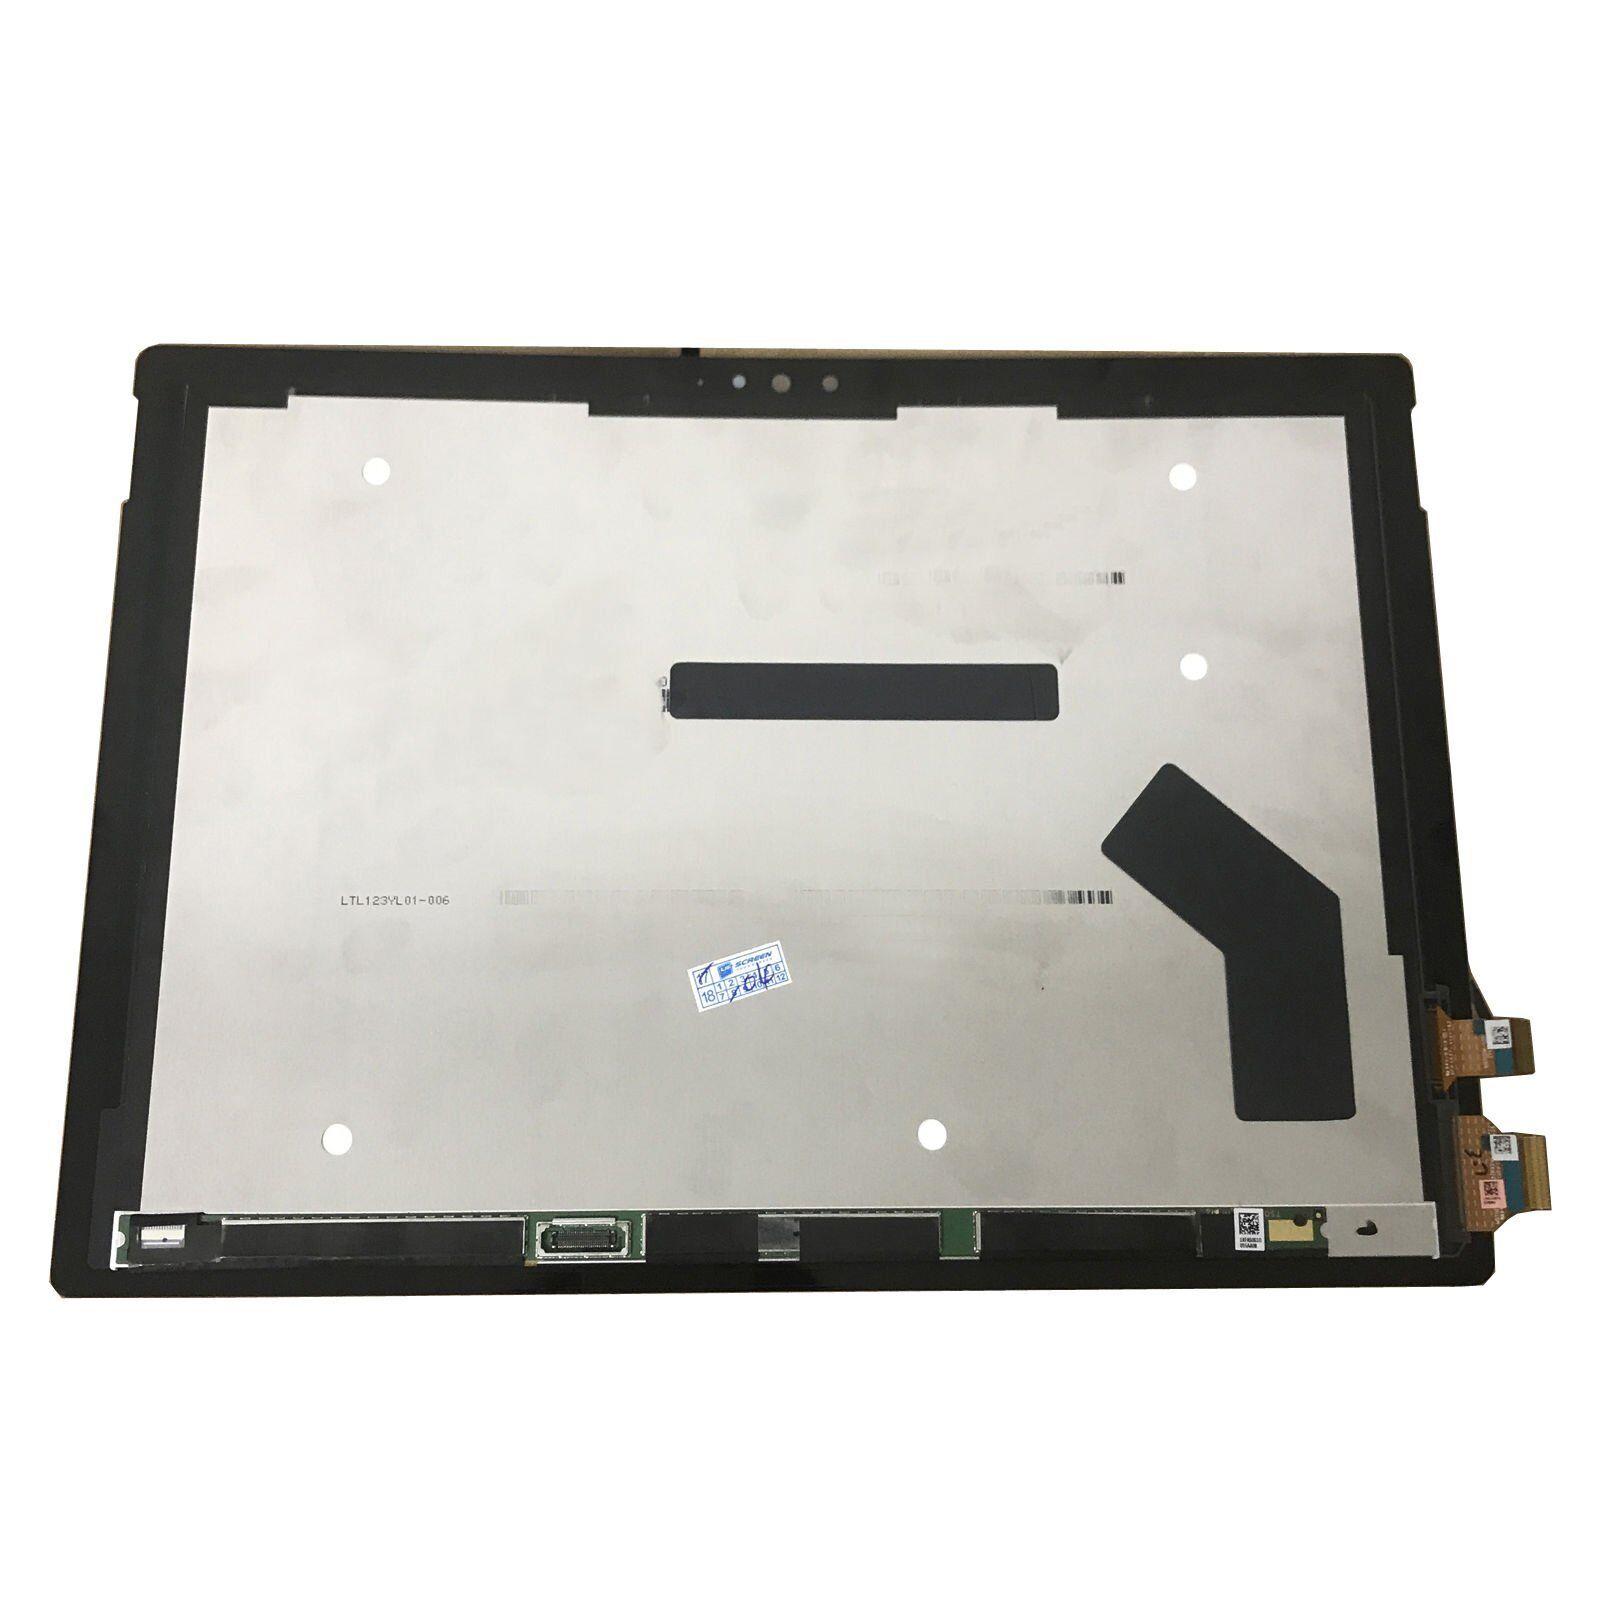 12.7mm Laptop Bezel Front Cover Faceplate Slot Load For Panasonic UJ-265A UJ-265